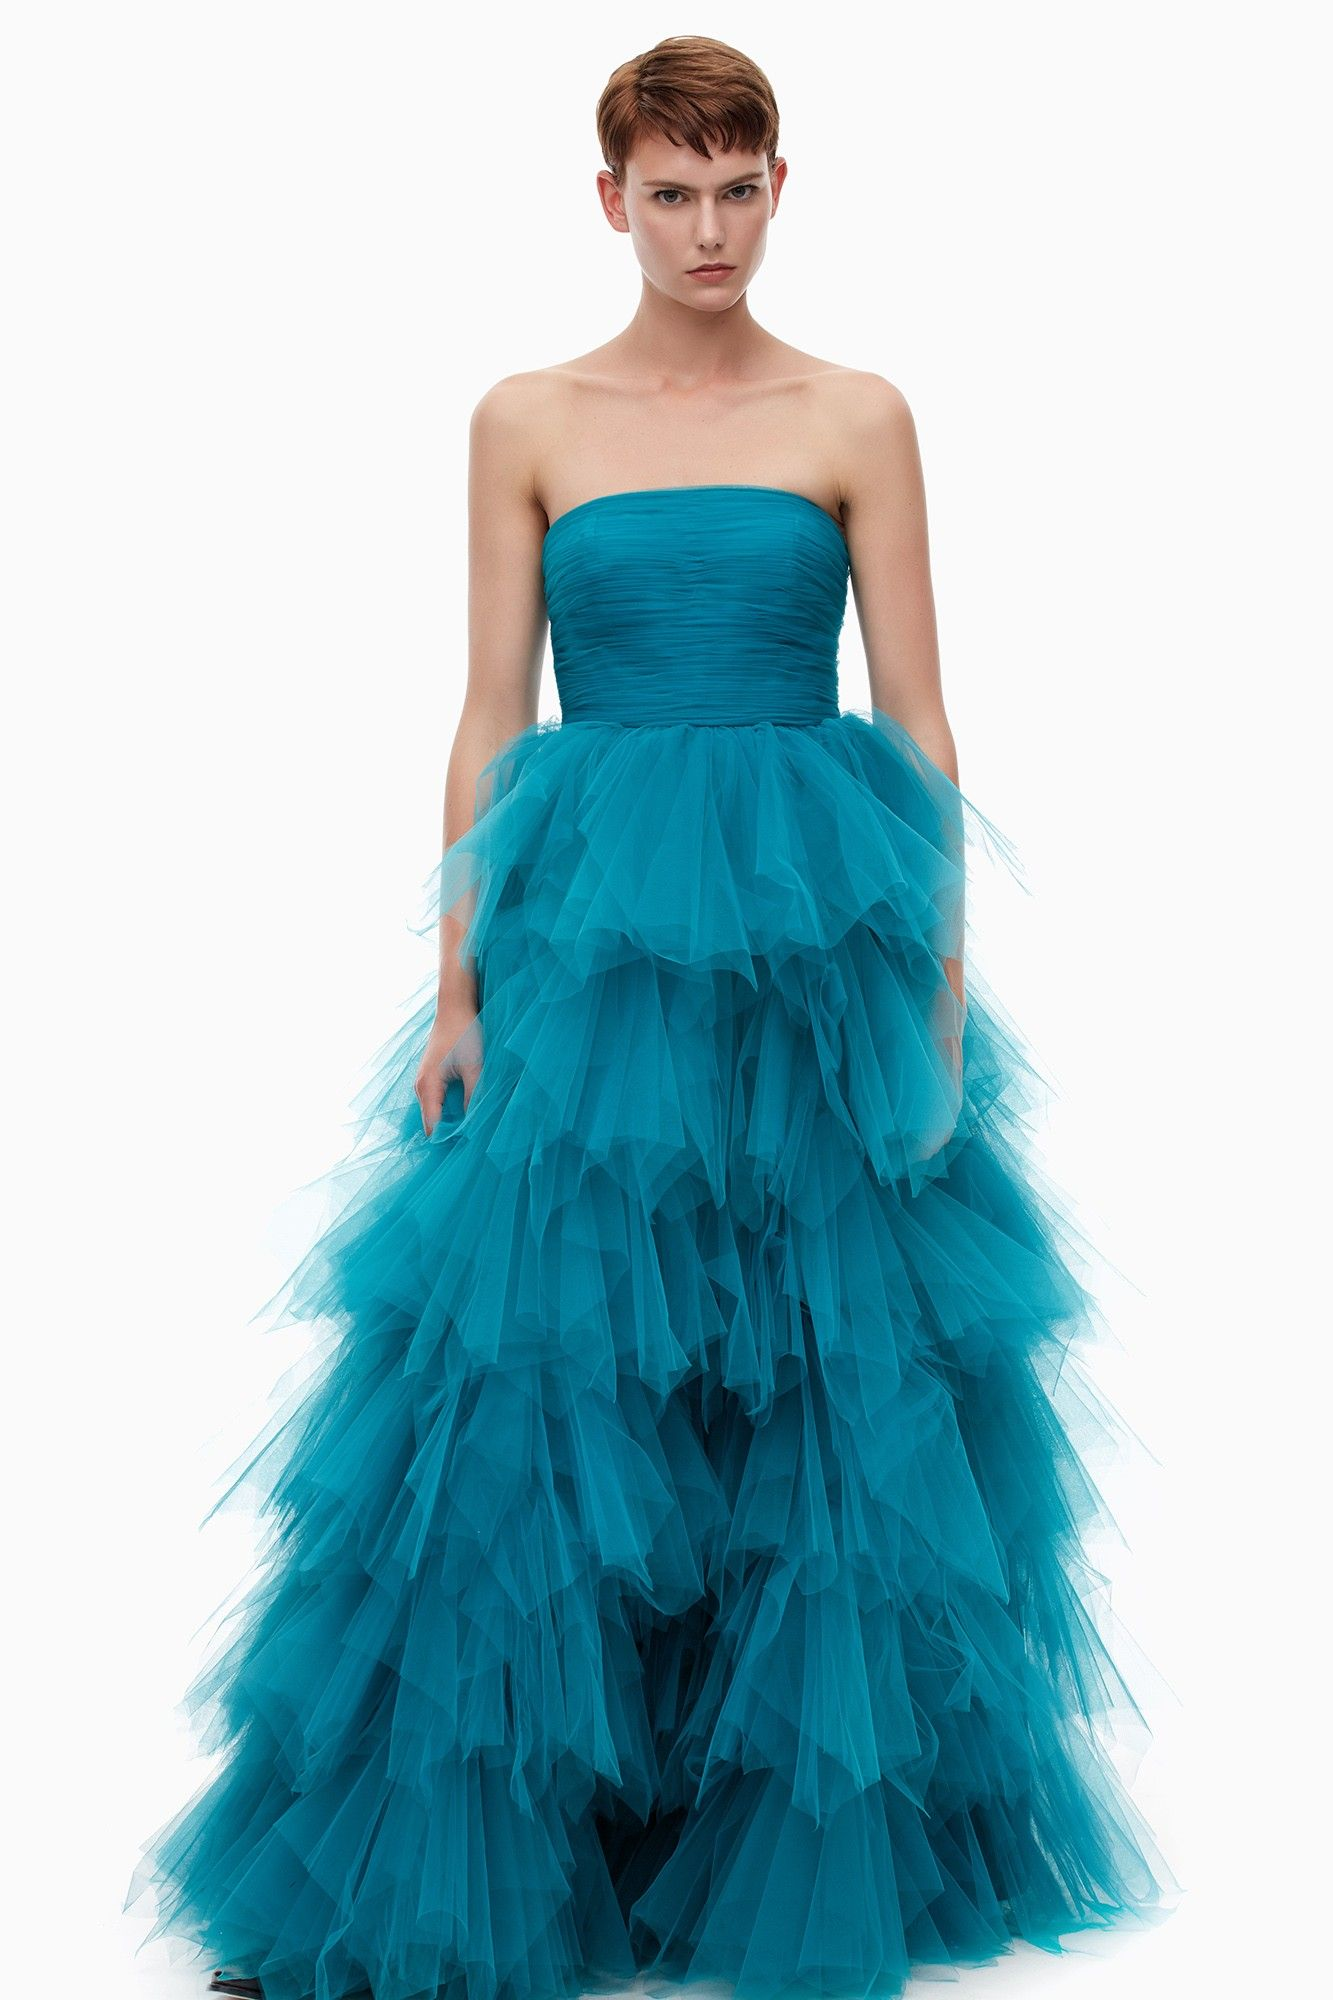 Vestido largo de inspiración bailarina - colección | Adolfo ...